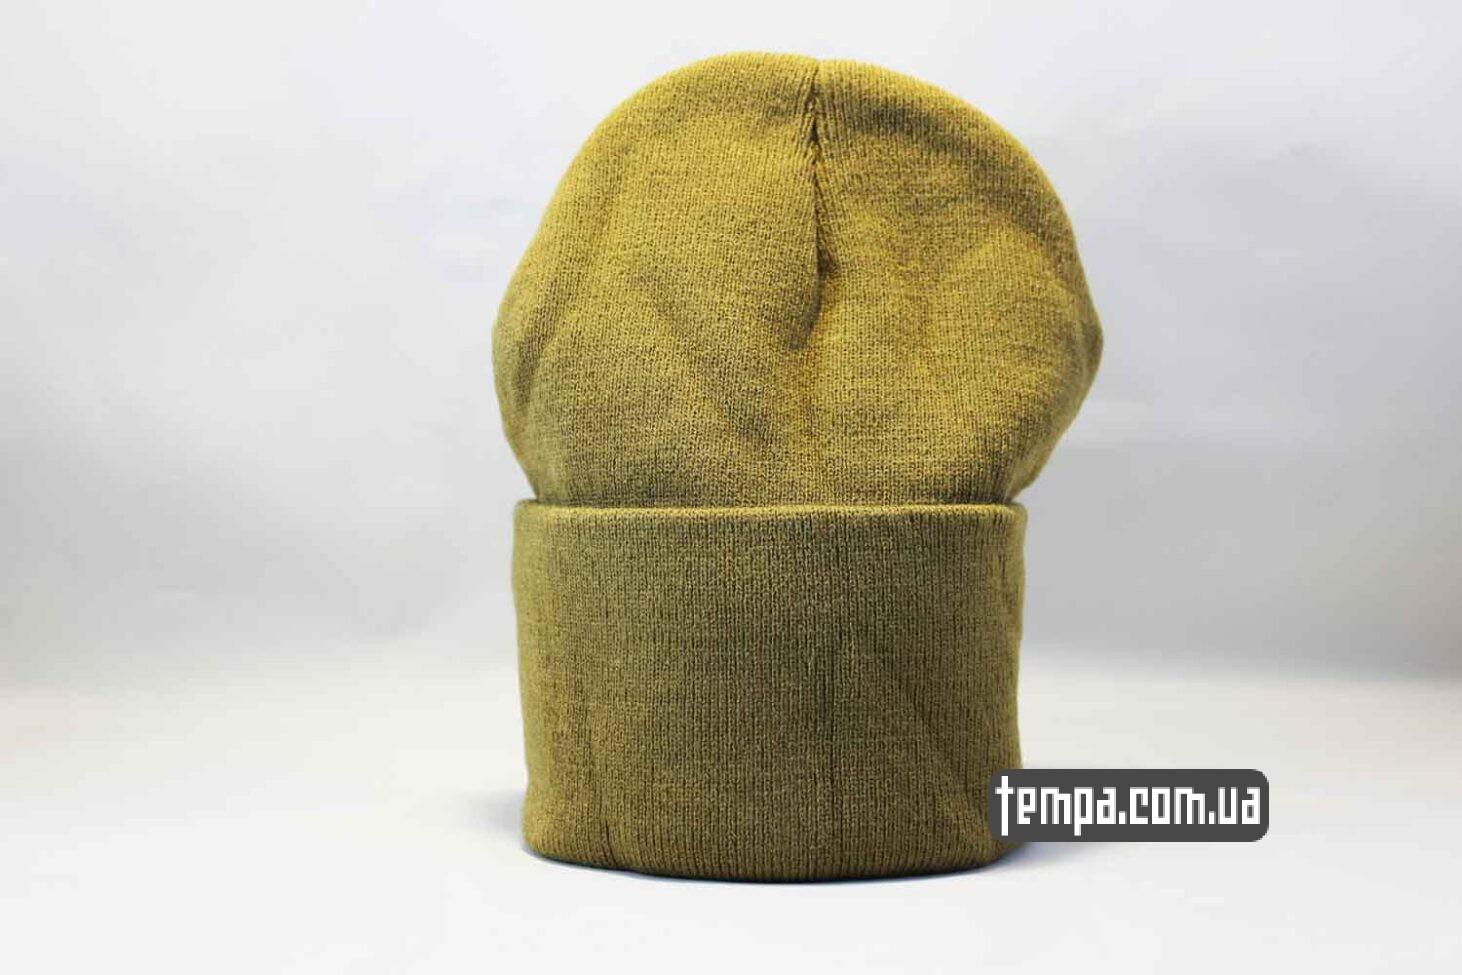 магазин одежды шапка beanie North Face желтая Норс Фейс Украина